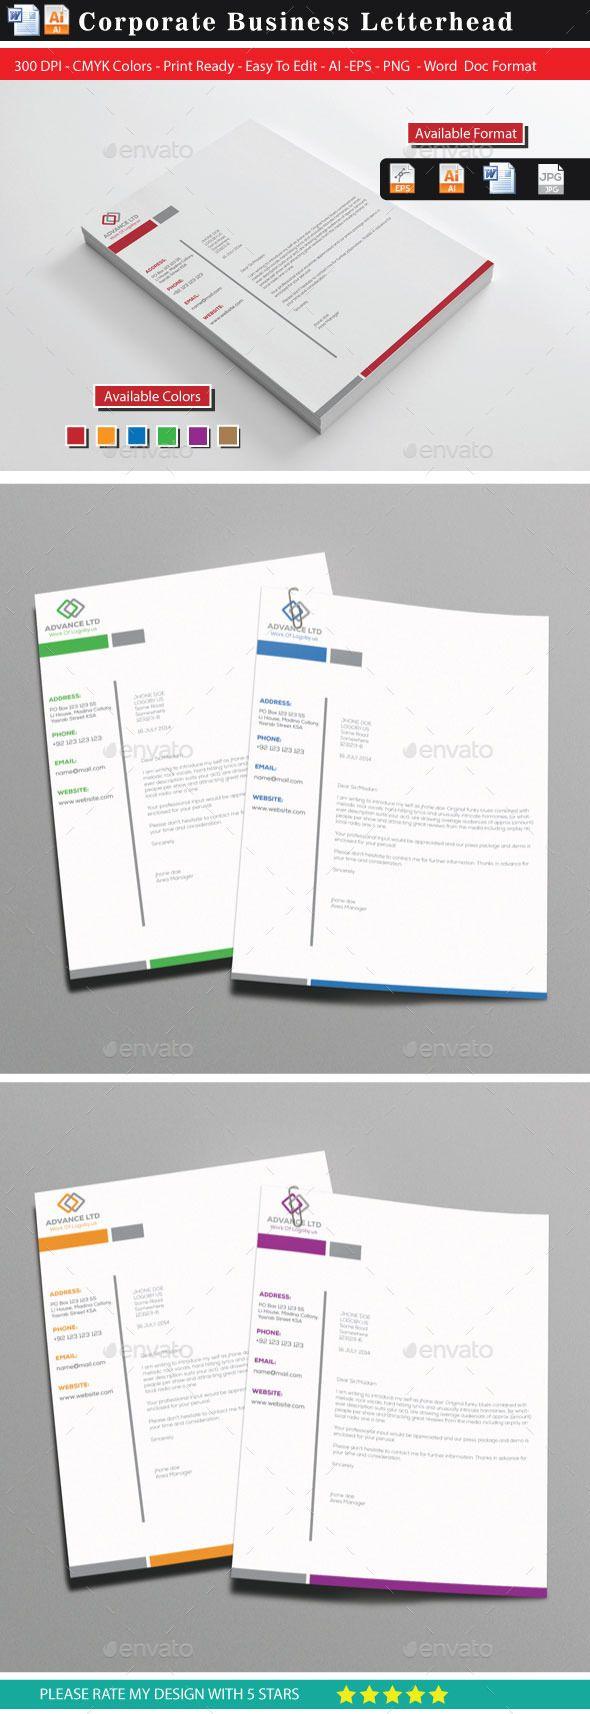 20 Advance Letterhead Design 25 best Letterhead